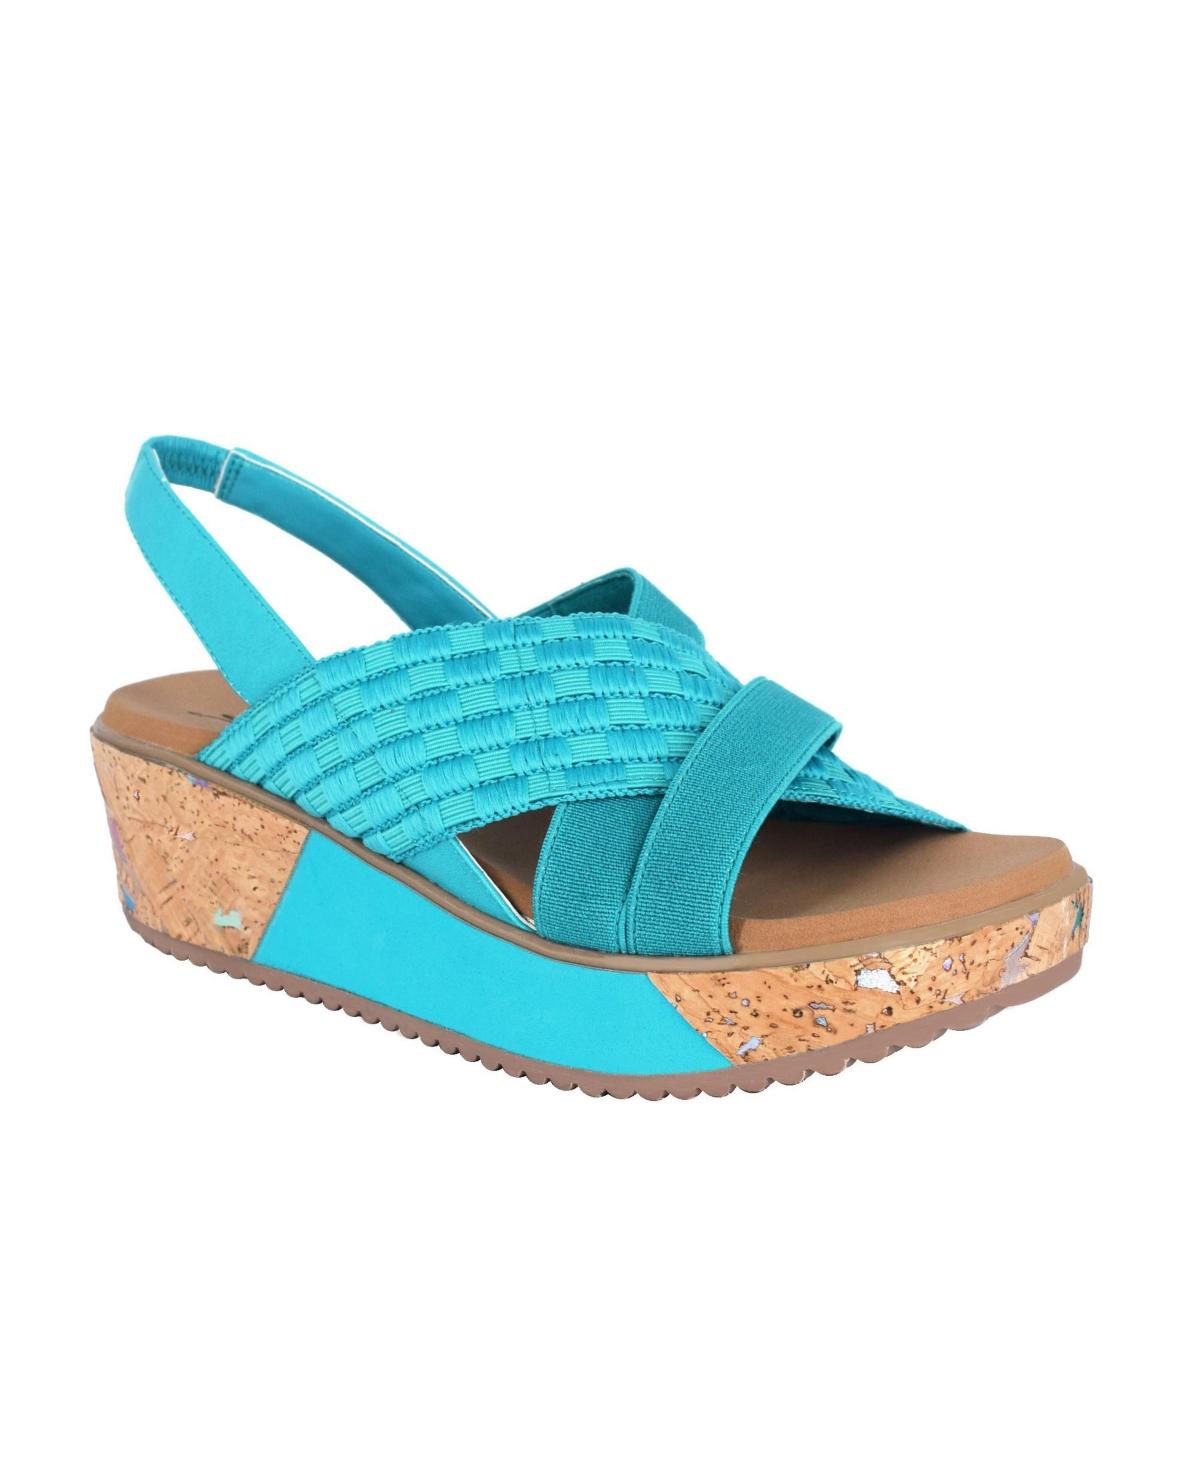 Impo Jolene Platform Sandal Women's Shoes